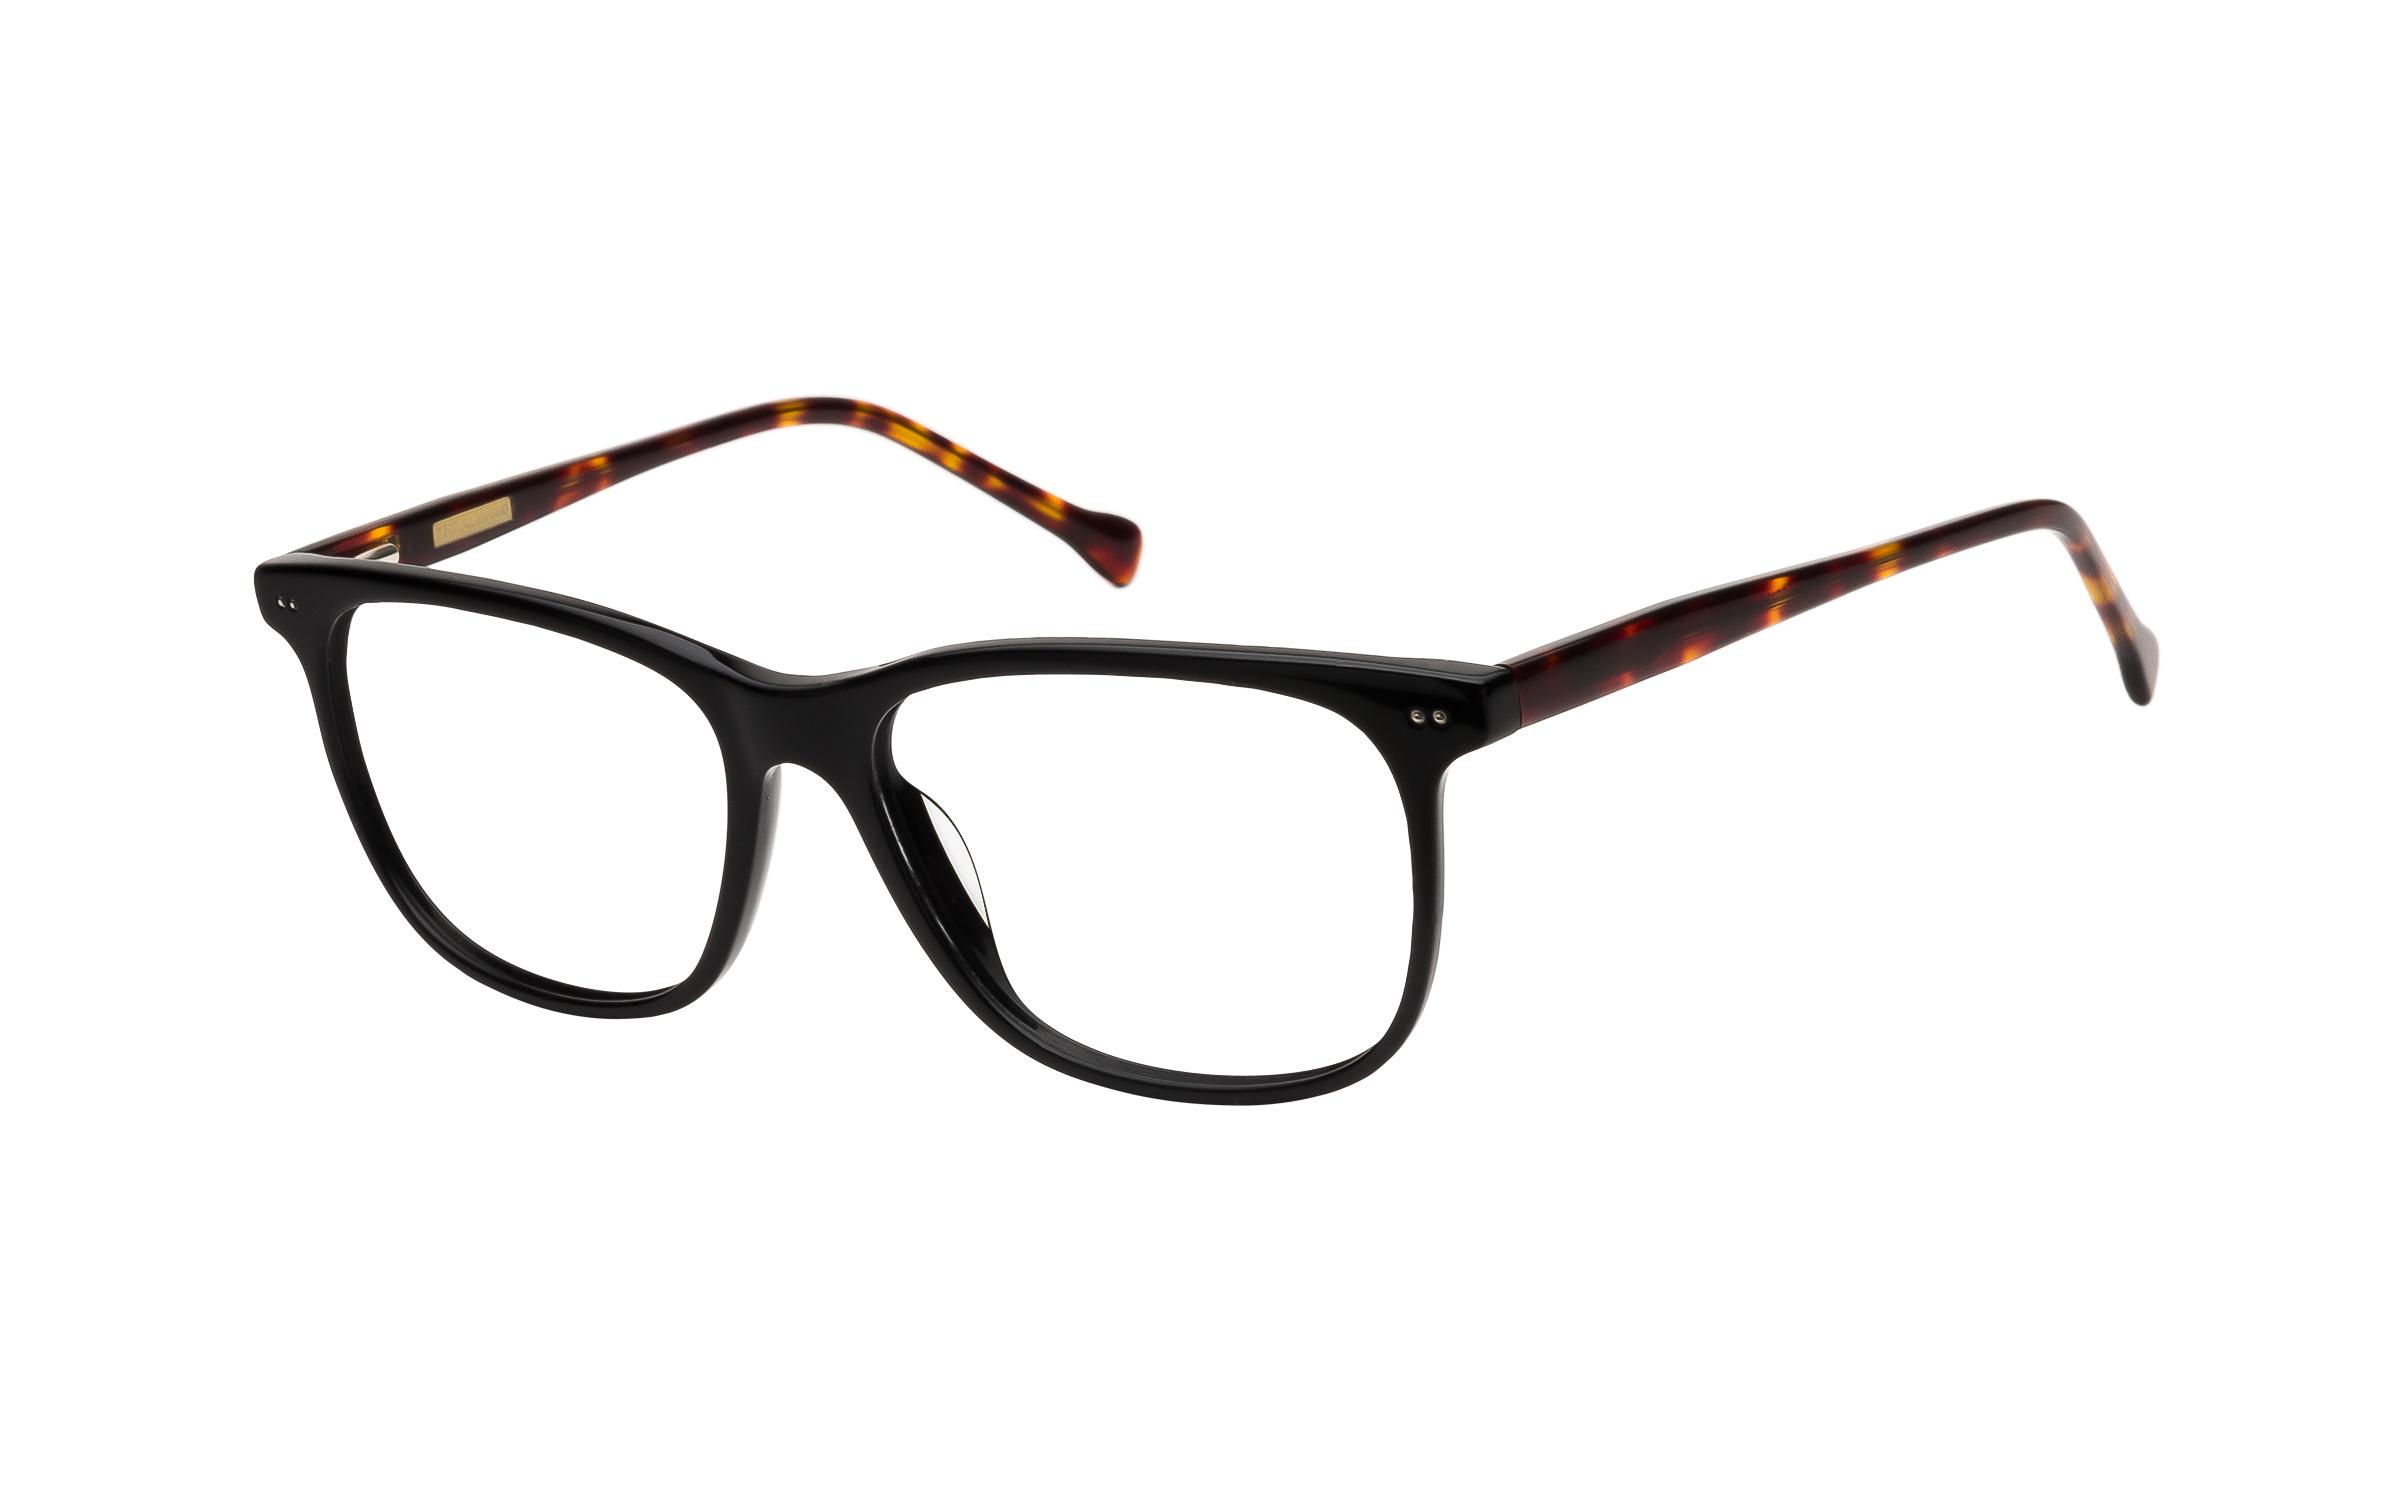 7 For All Mankind 811 Eyeglasses and Frame in Black/Tortoise - Online